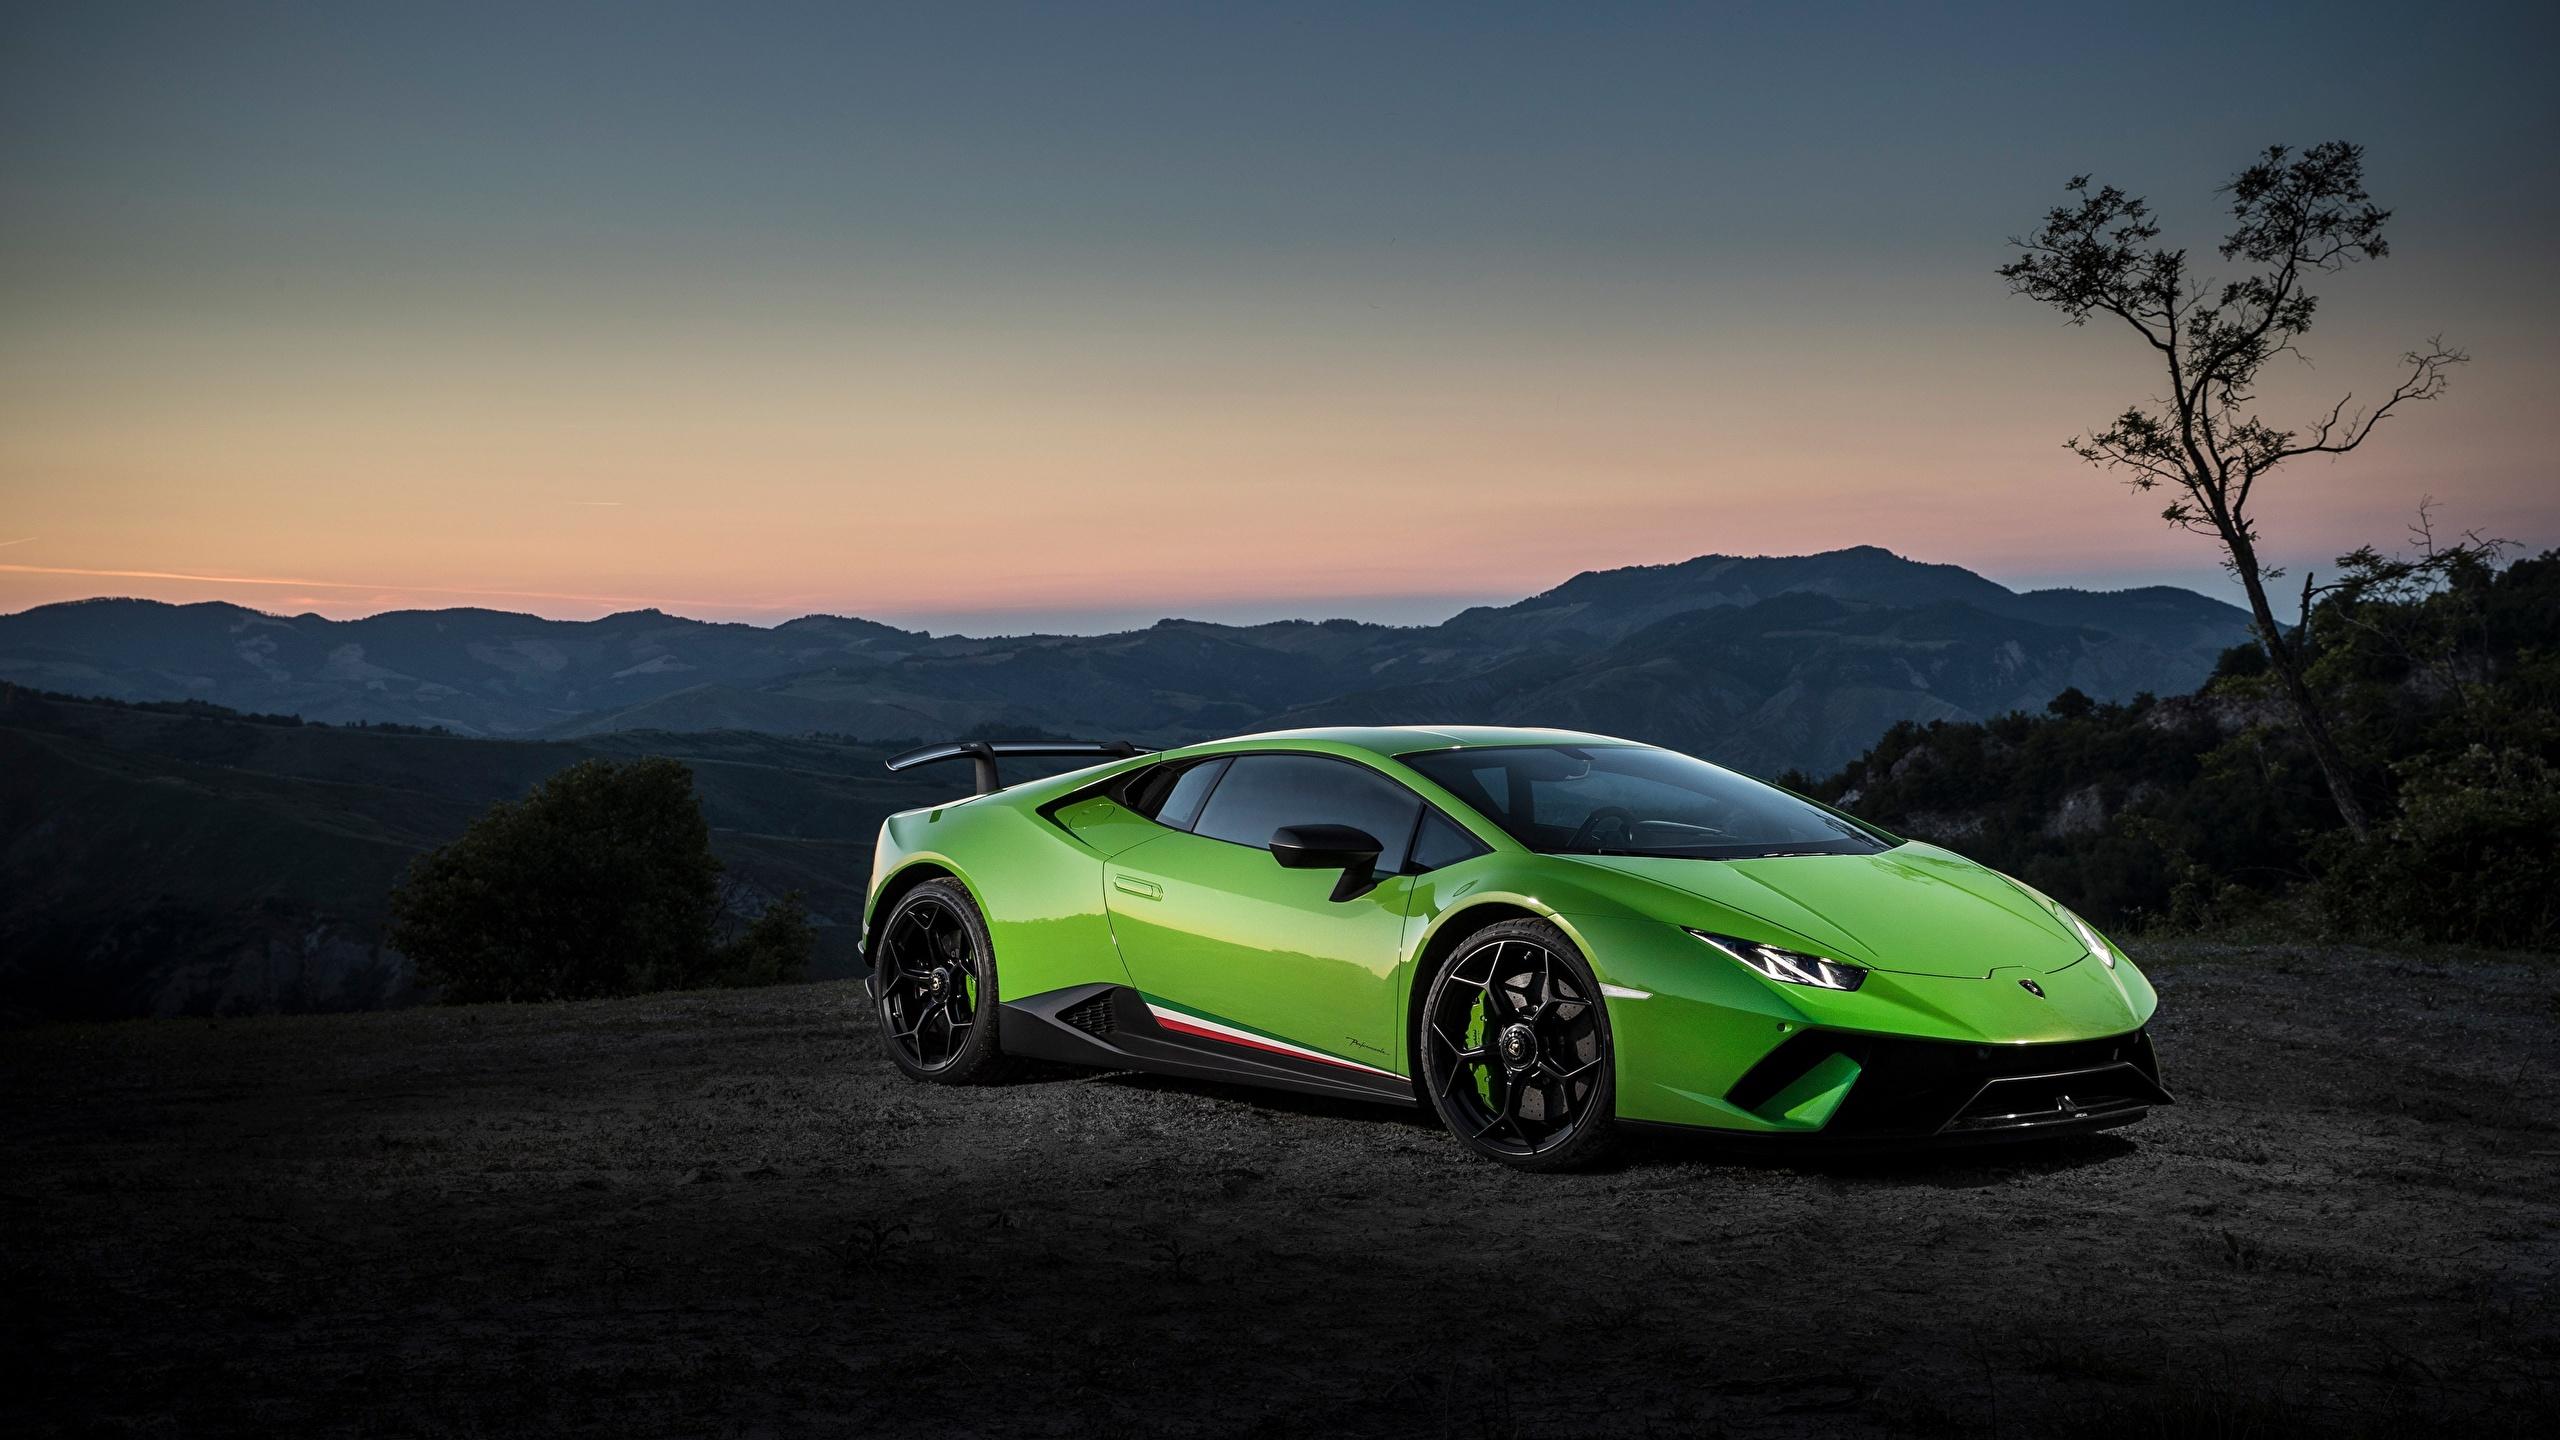 Image Lamborghini Huracan Performante Green Cars 2560x1440